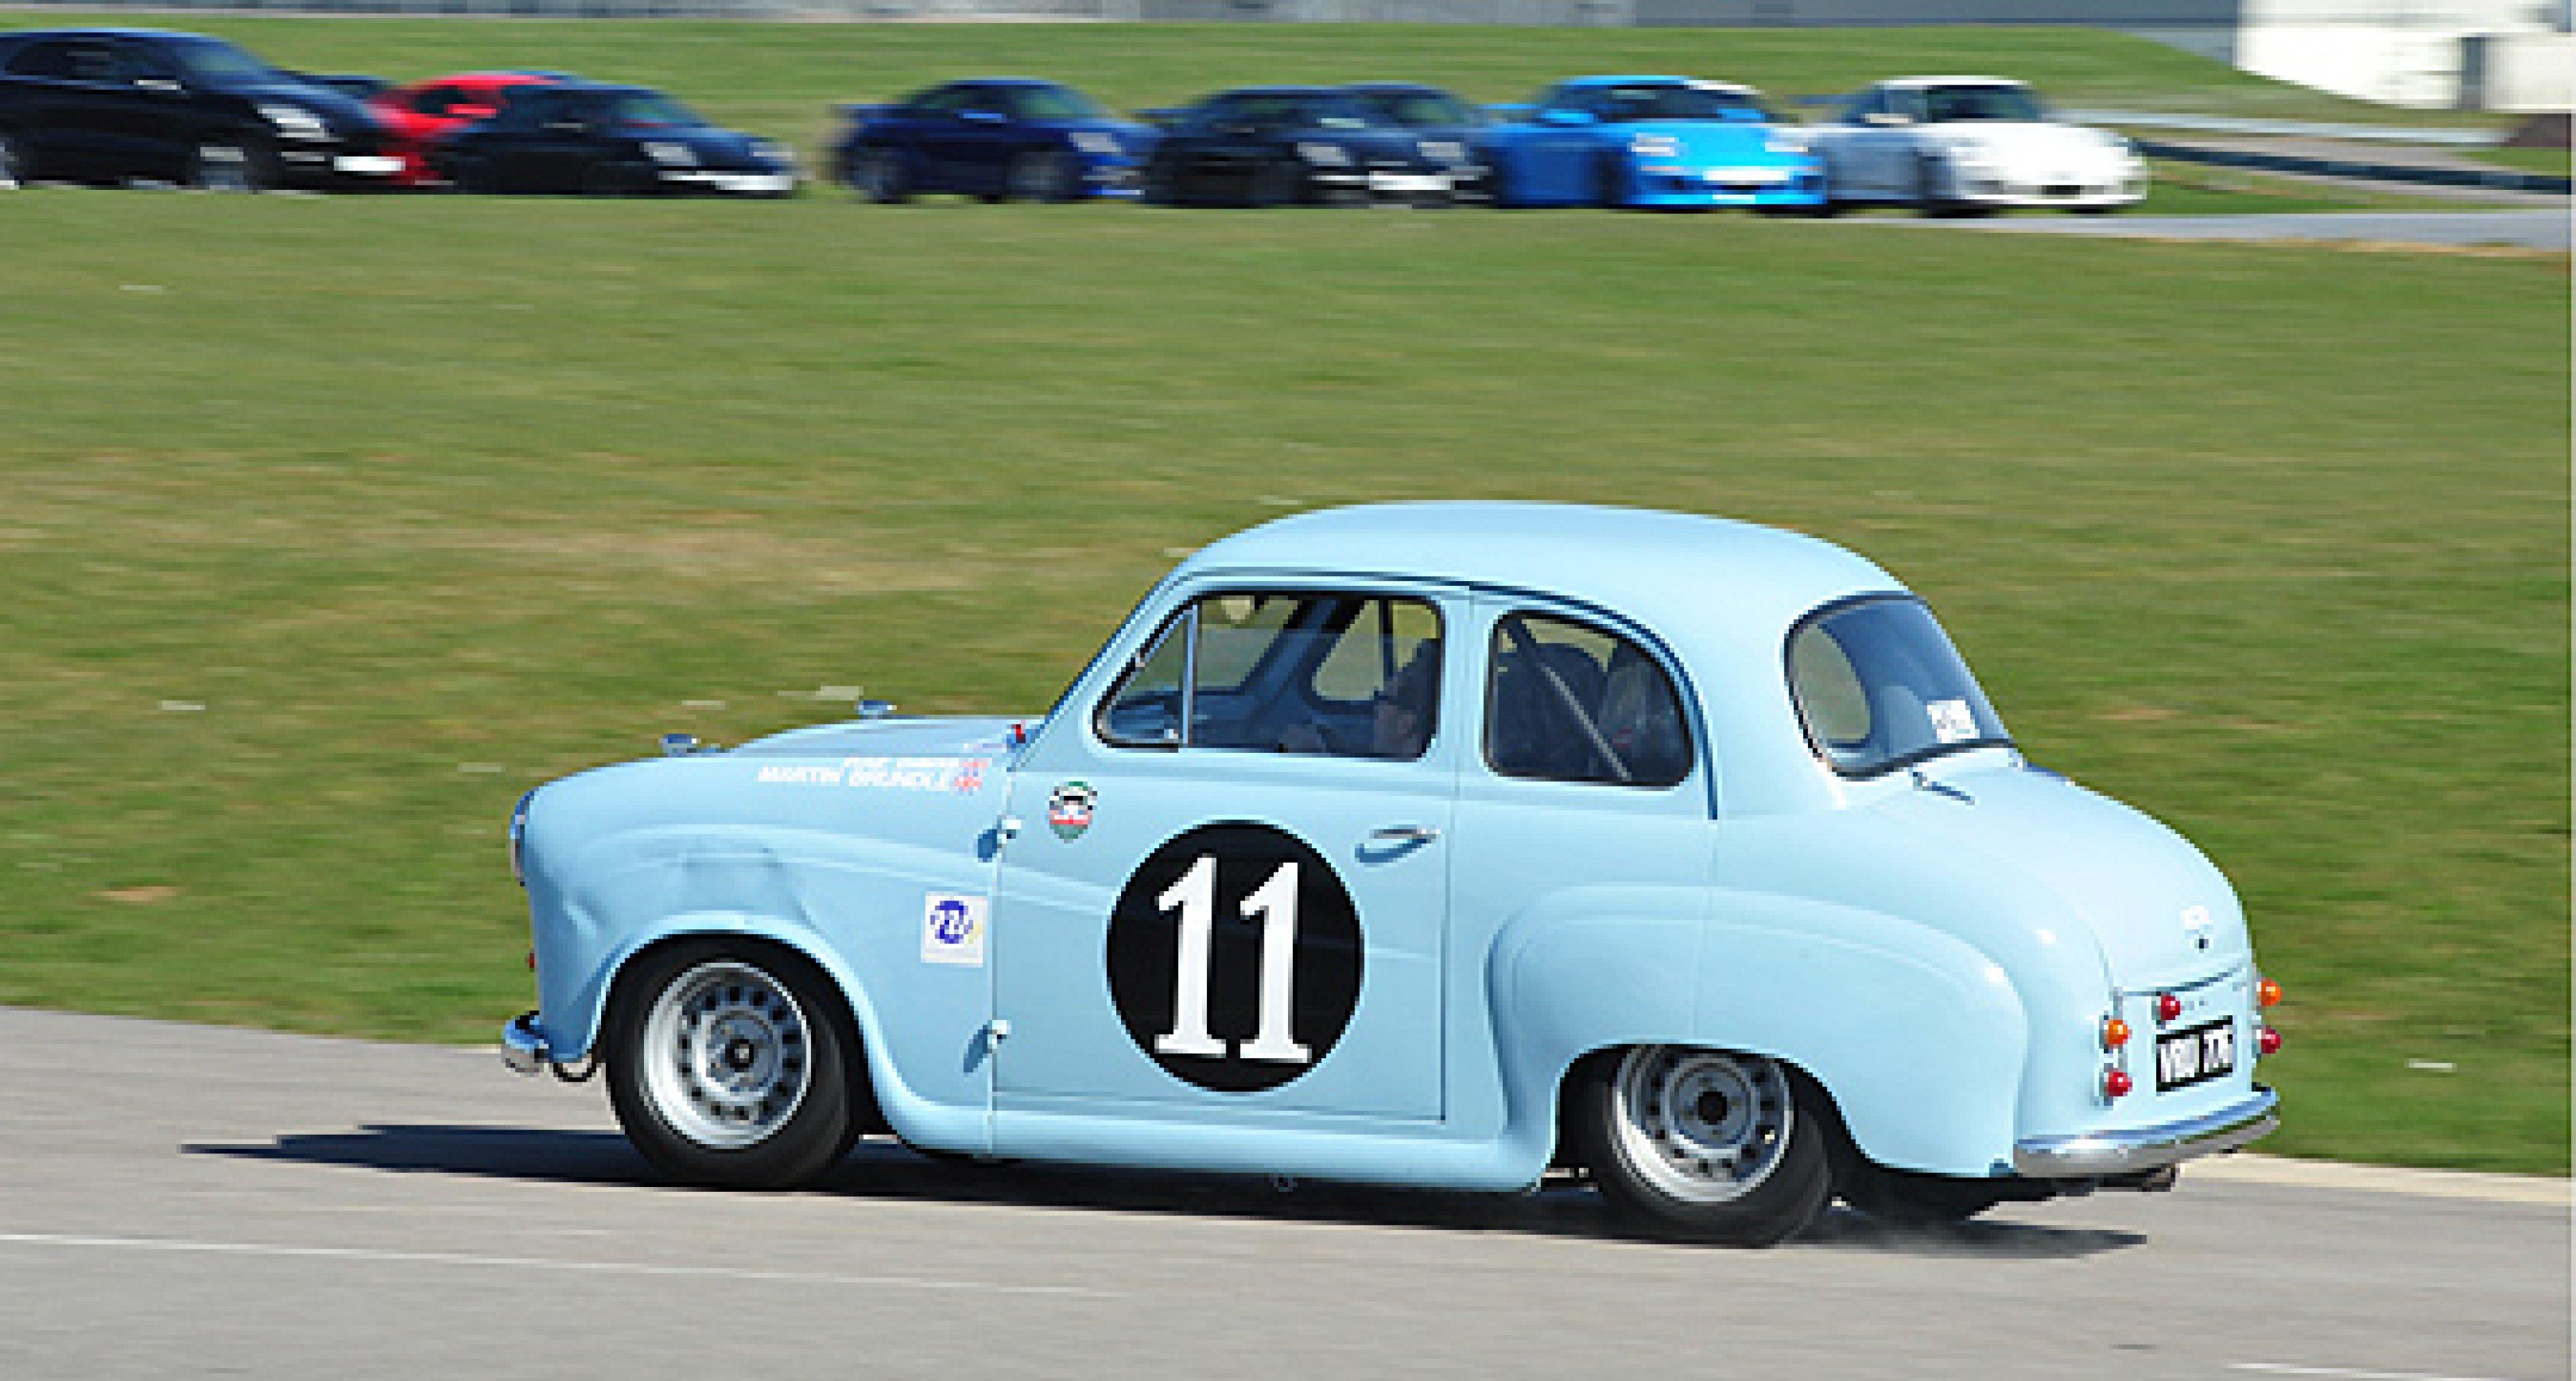 HRDC: A Return to 'Old School' Club Racing...